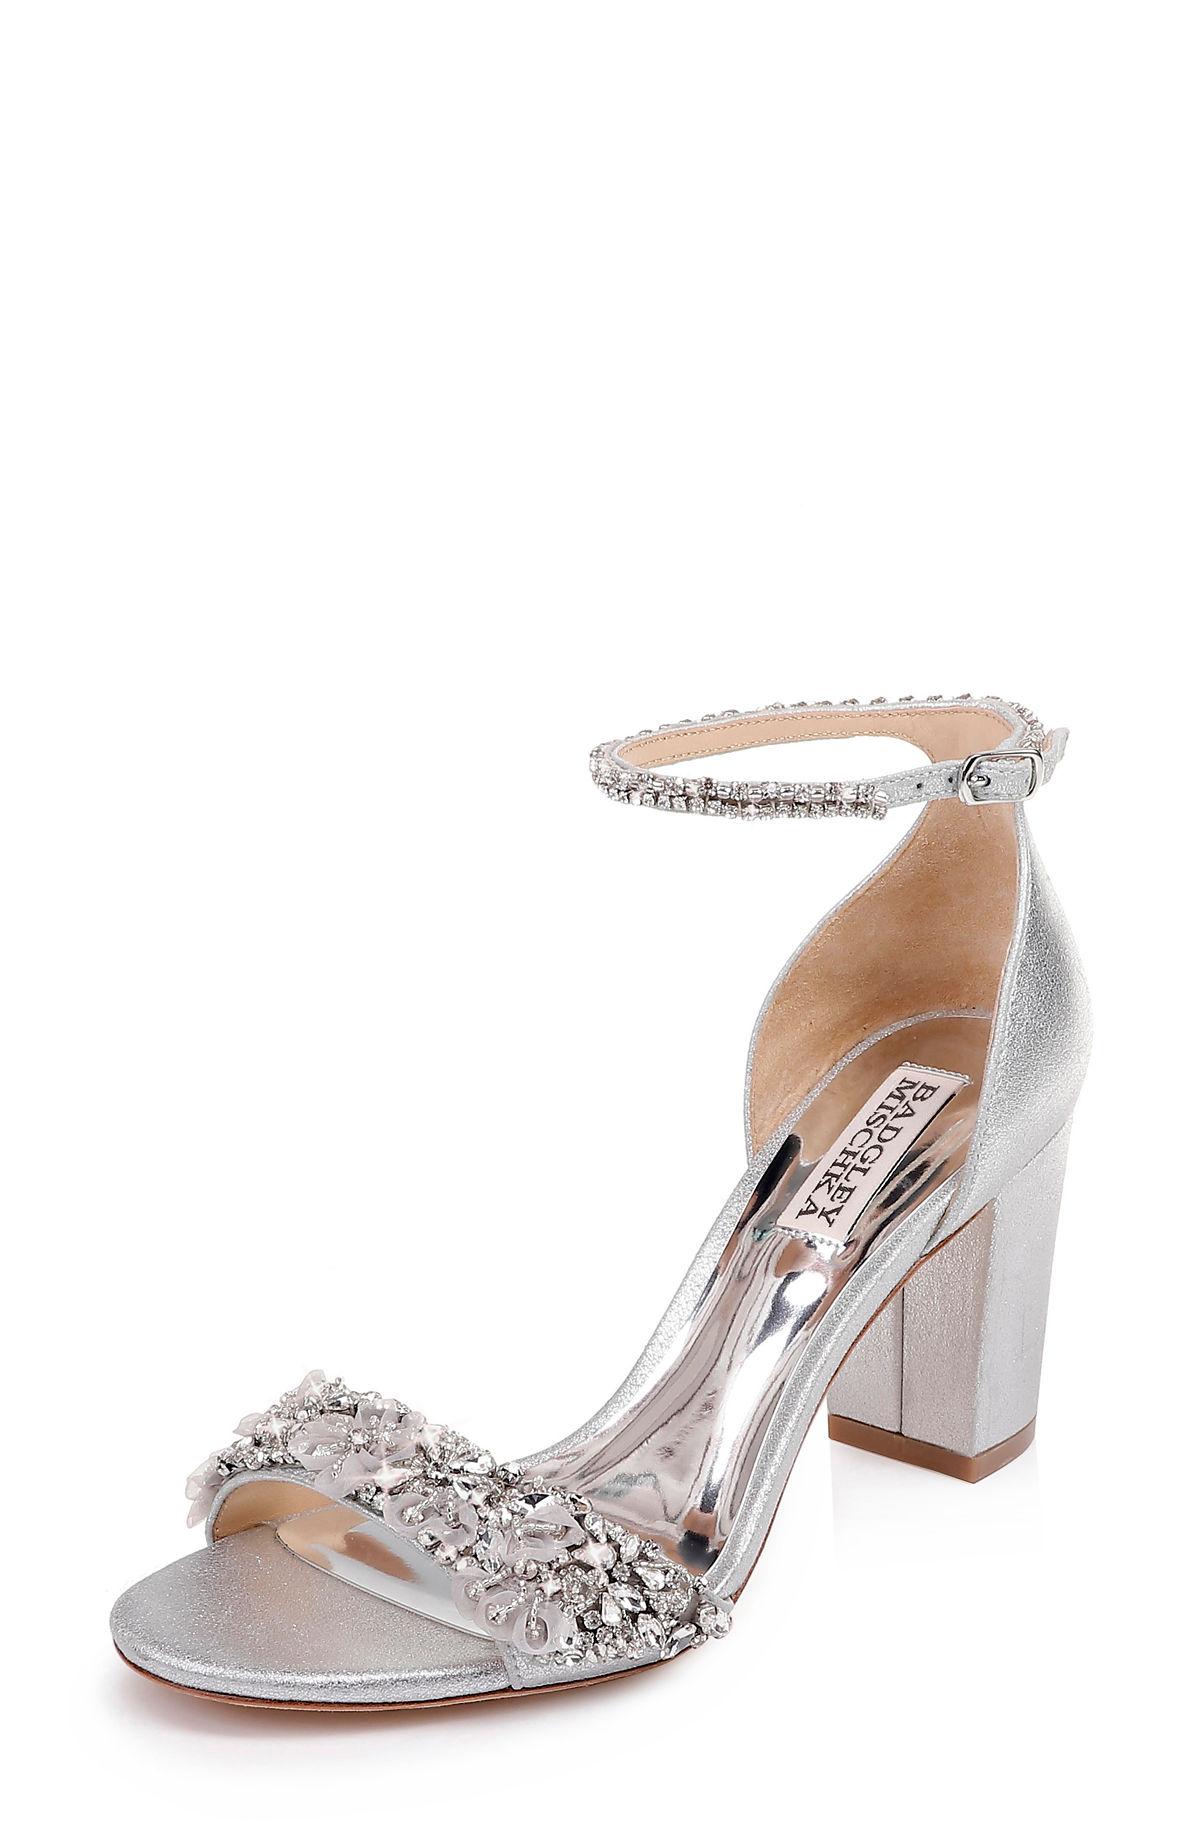 5da6c534087 Badgley Mischka Women s Finesse Ii Embellished Block Heel Sandals In Silver  Metallic Satin